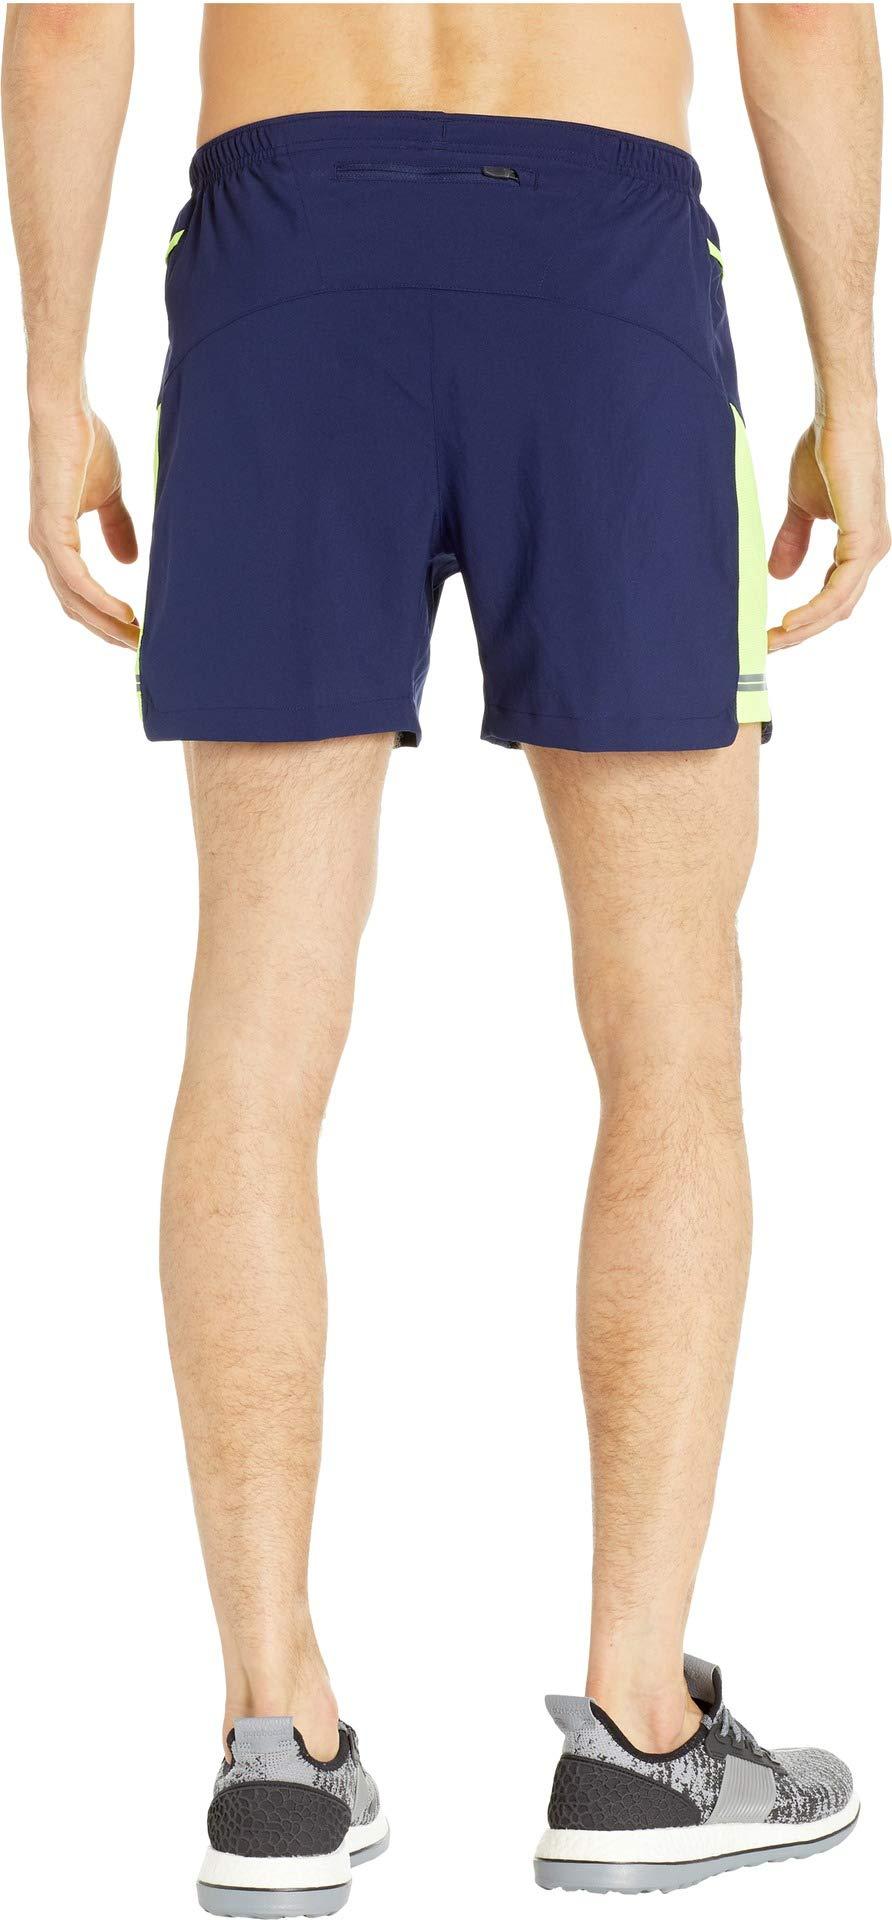 Brooks Men's Sherpa 5'' Shorts Navy/Nightlife Medium 5 by Brooks (Image #3)